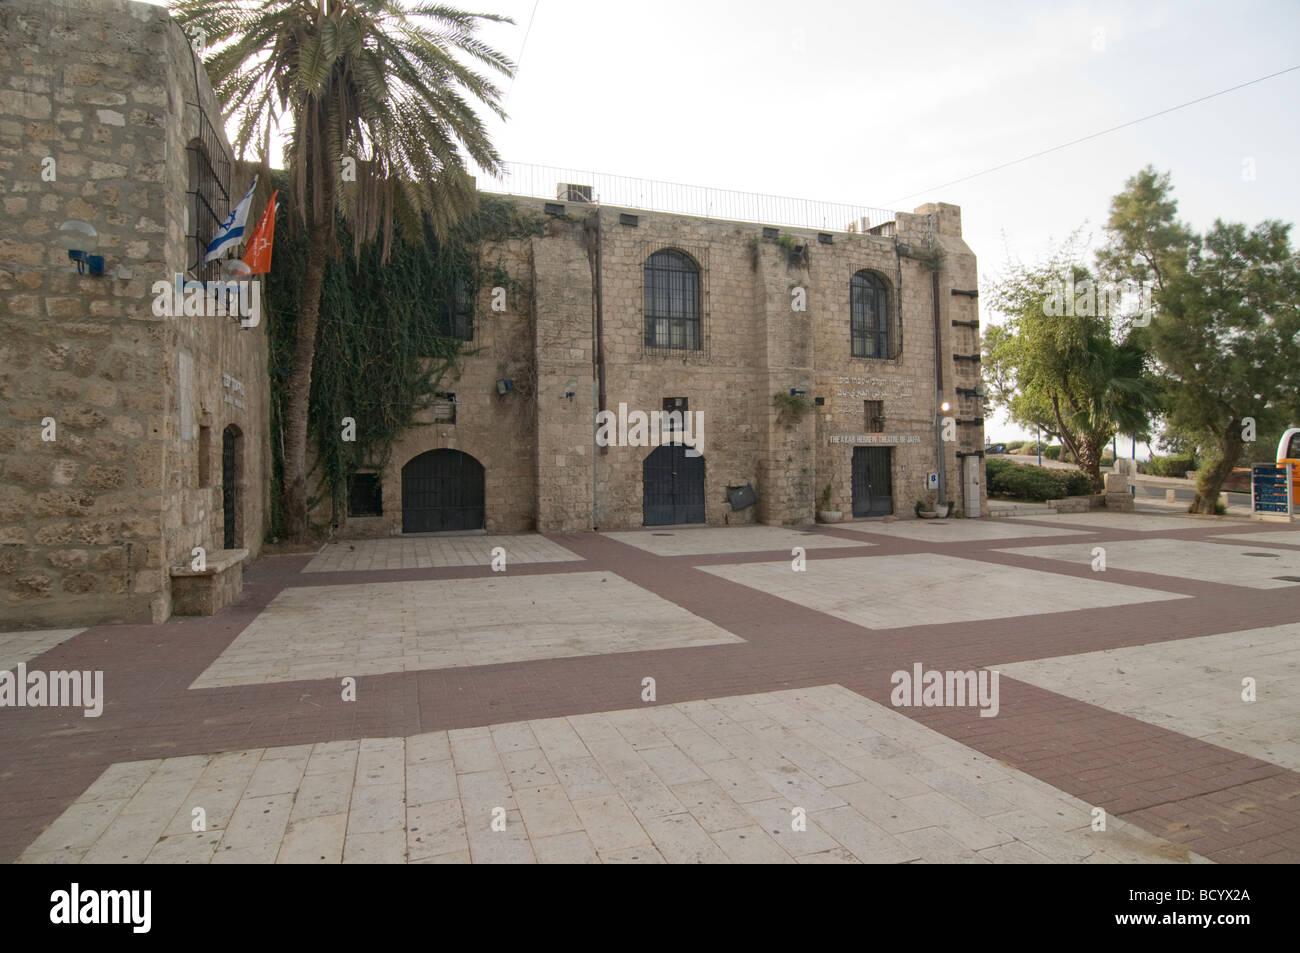 Israel Old City of Jaffa The Arab Hebrew Theatre - Stock Image